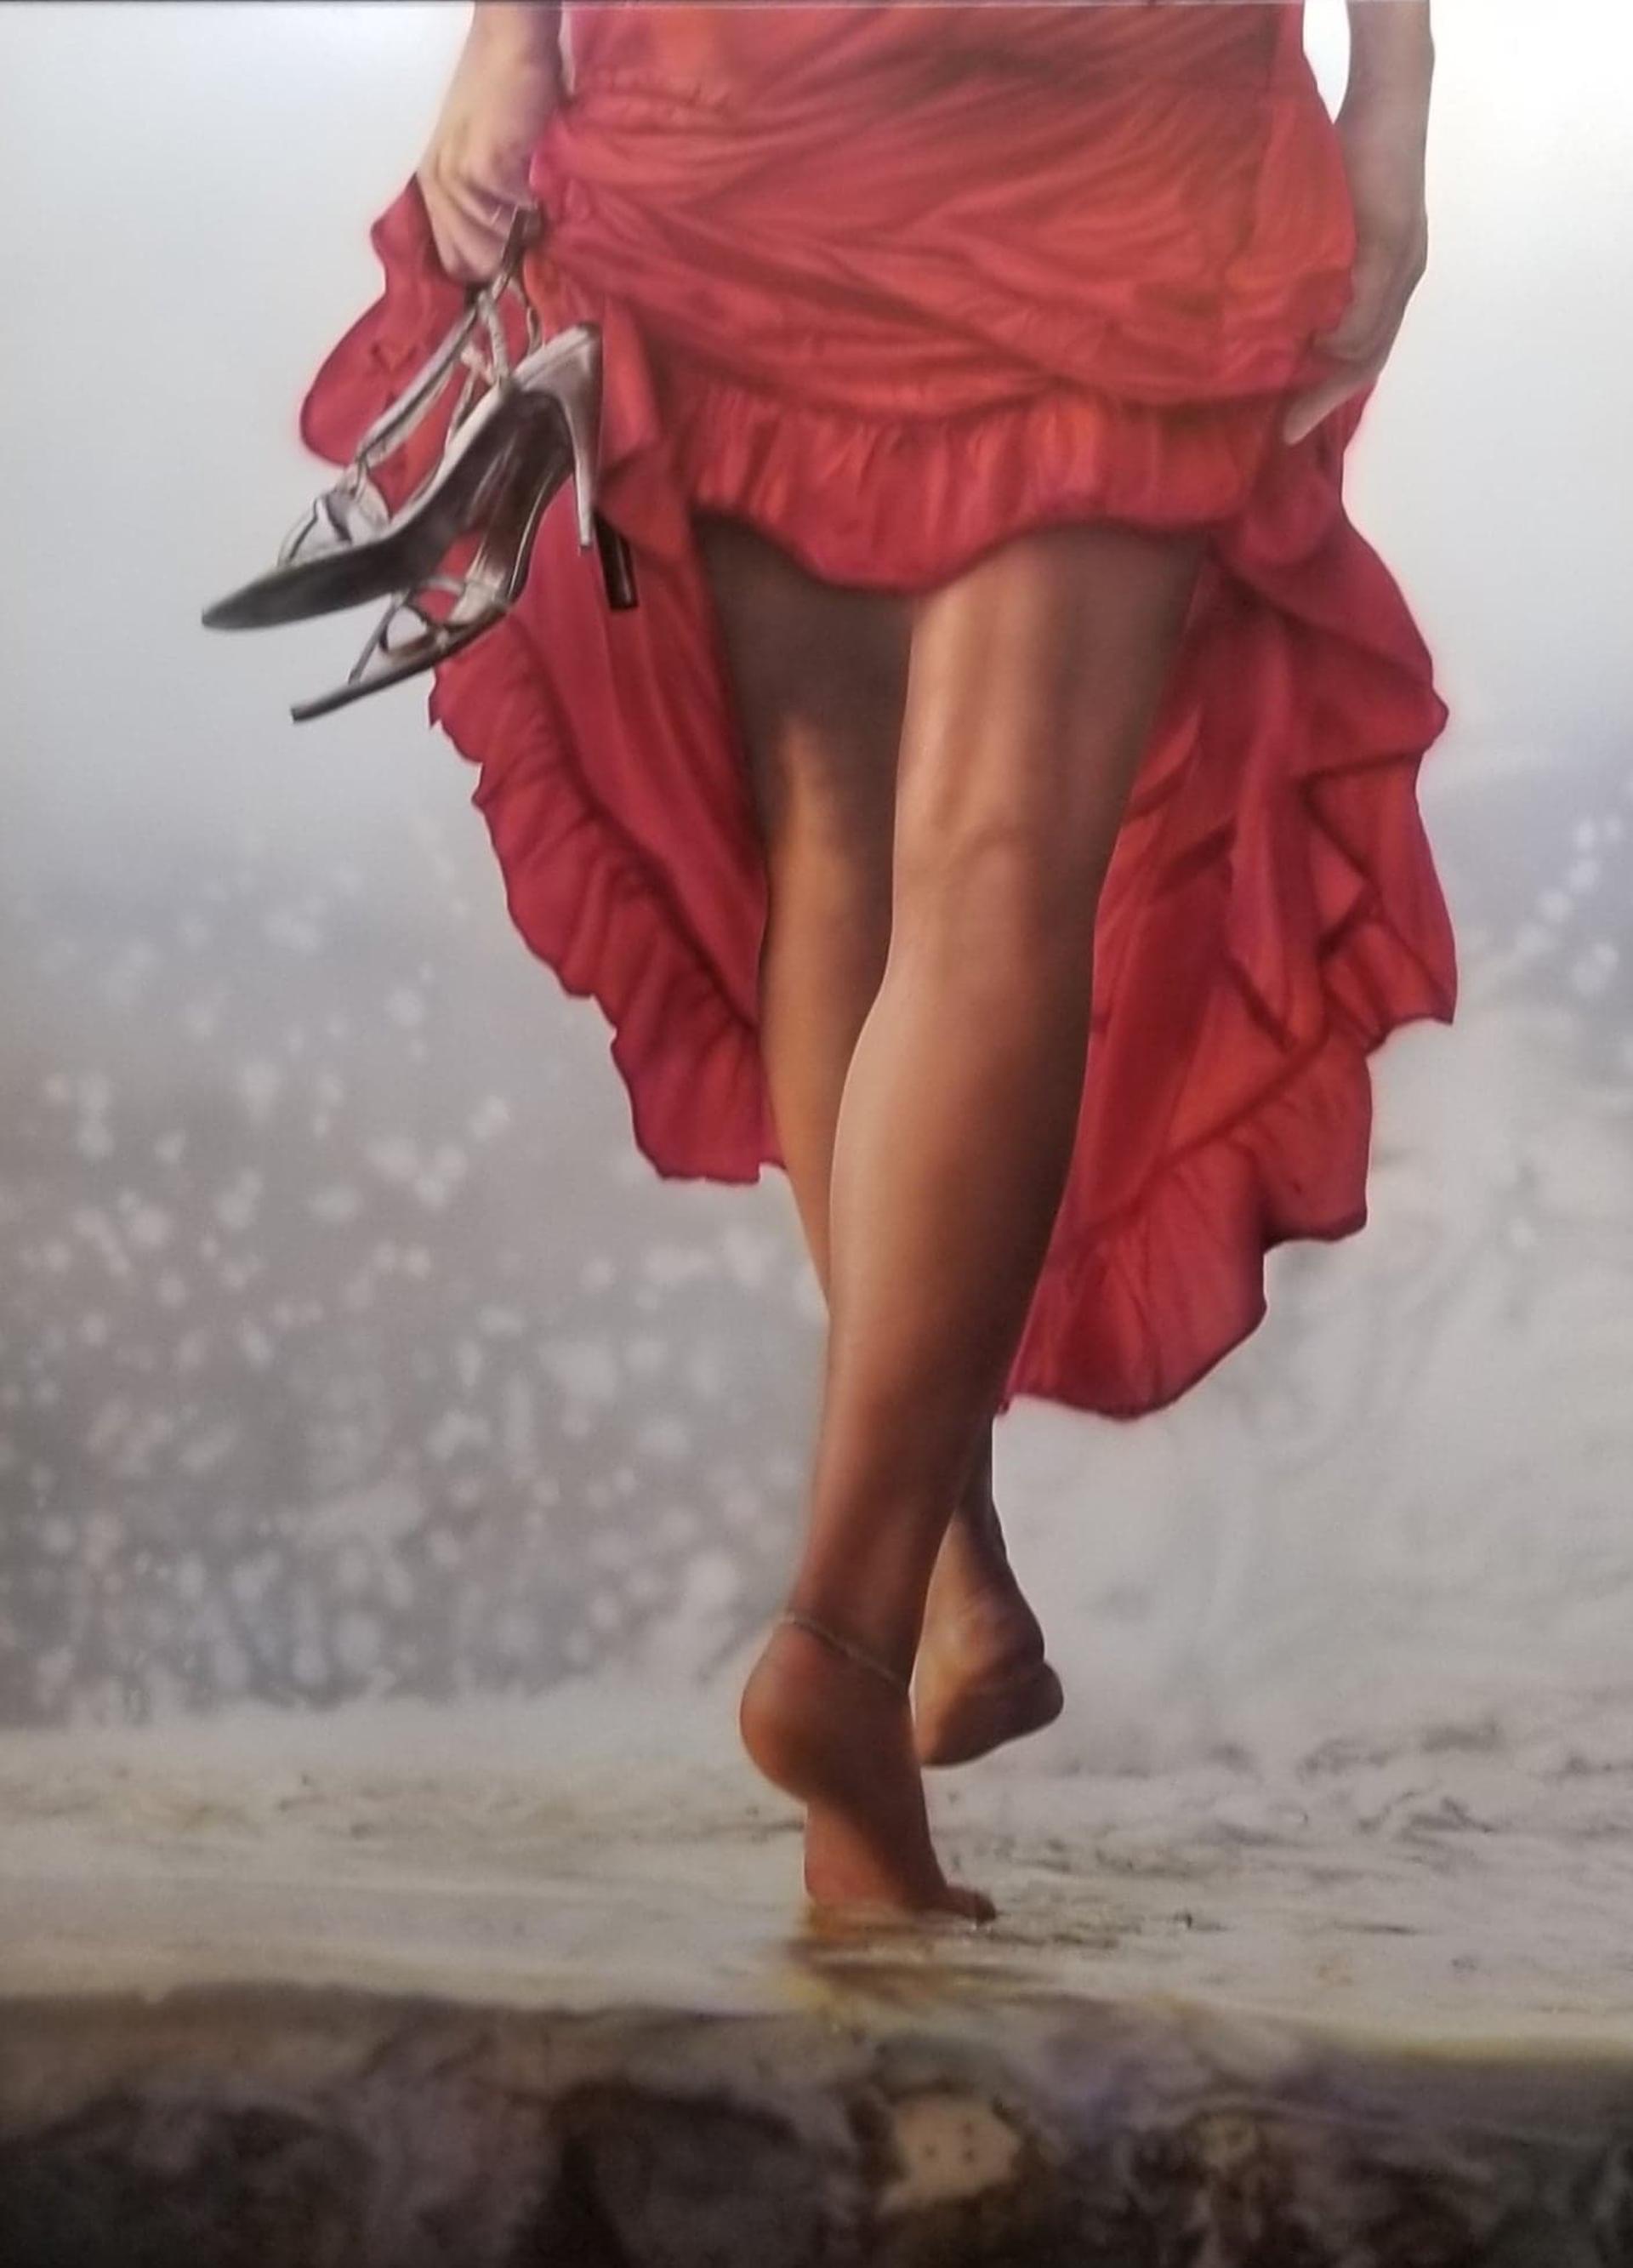 That Feeling by Silvia Belviso